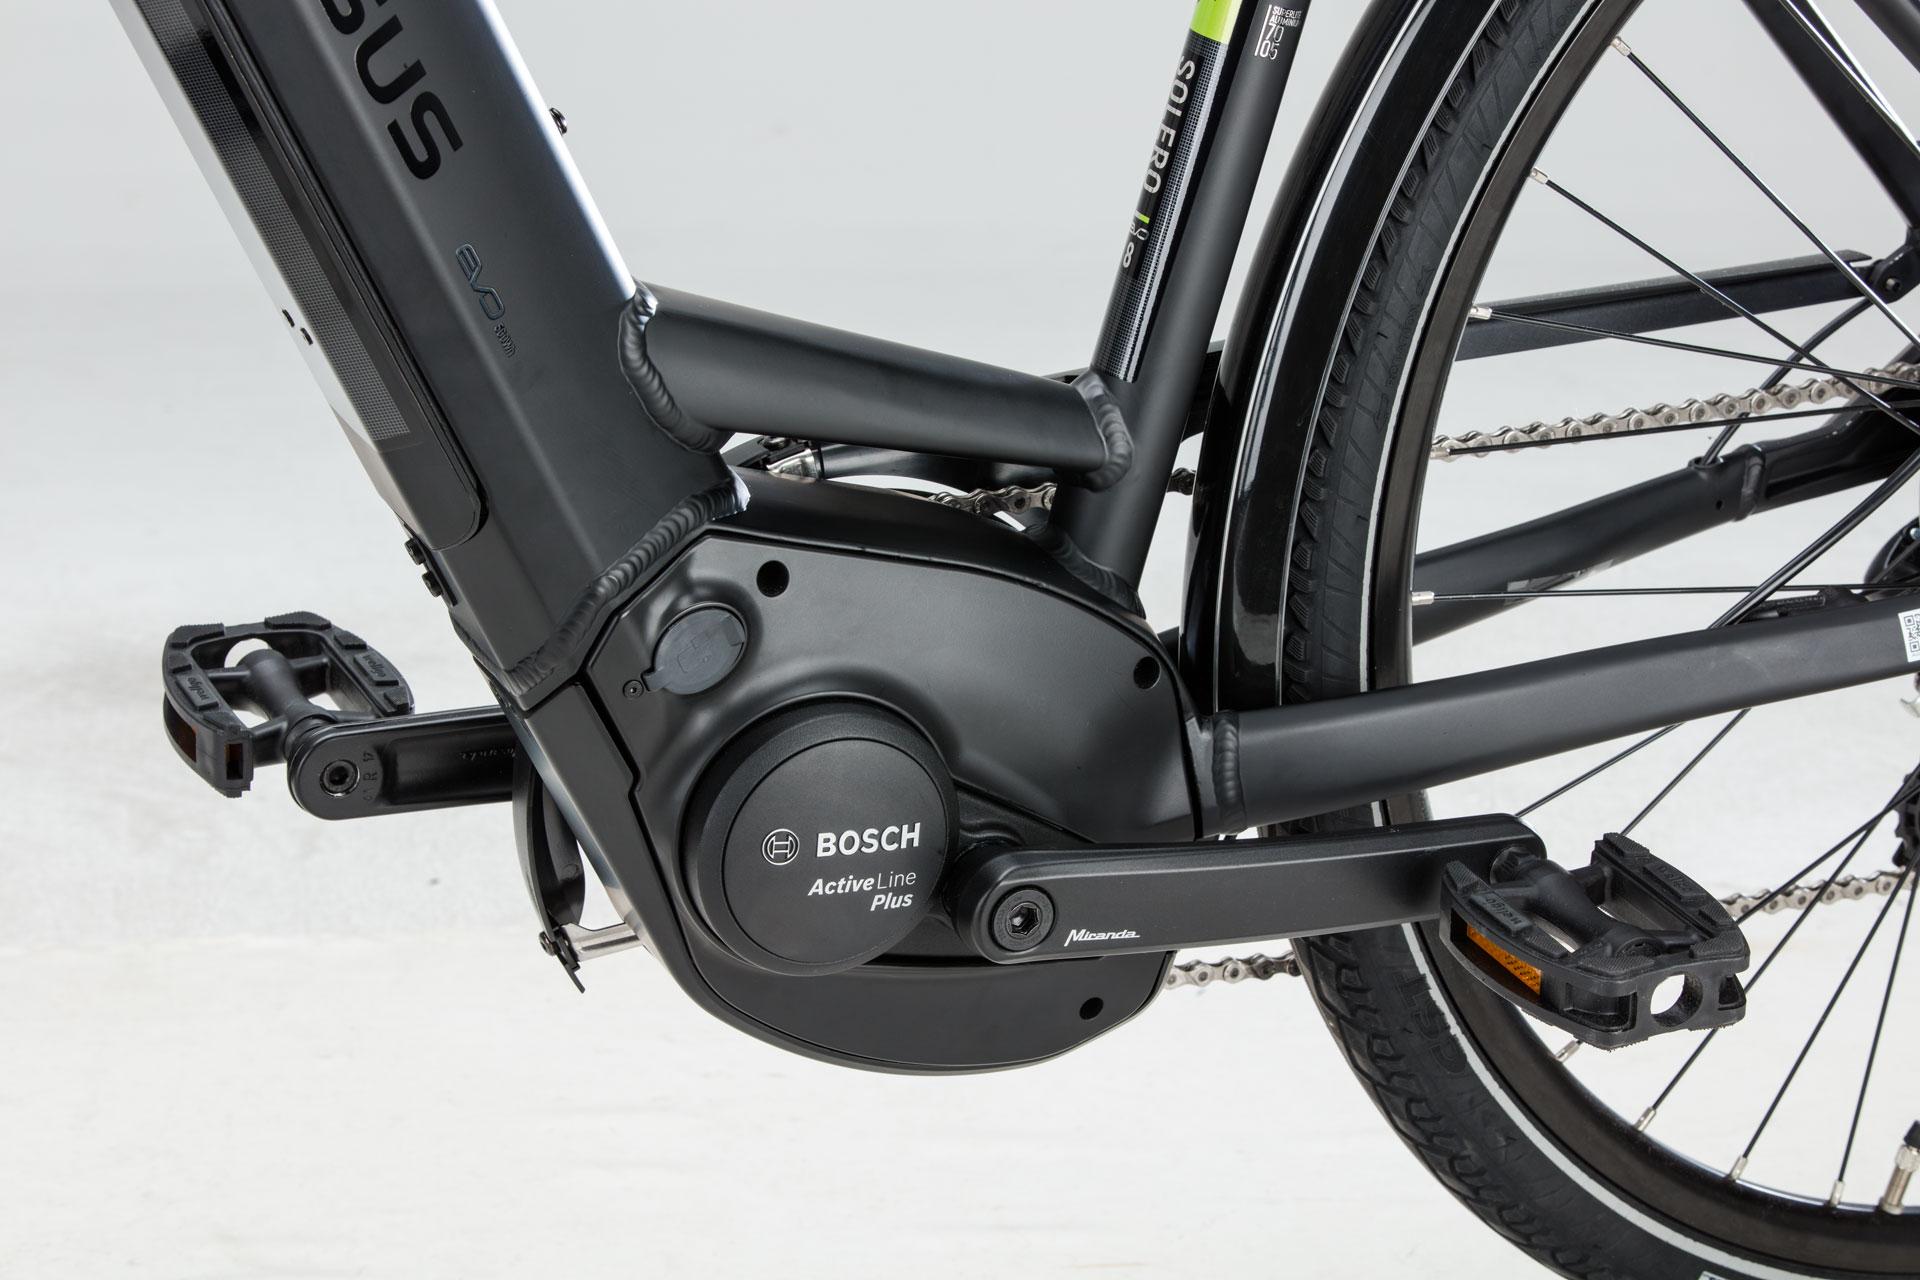 De Bosch Active Line Plus motor